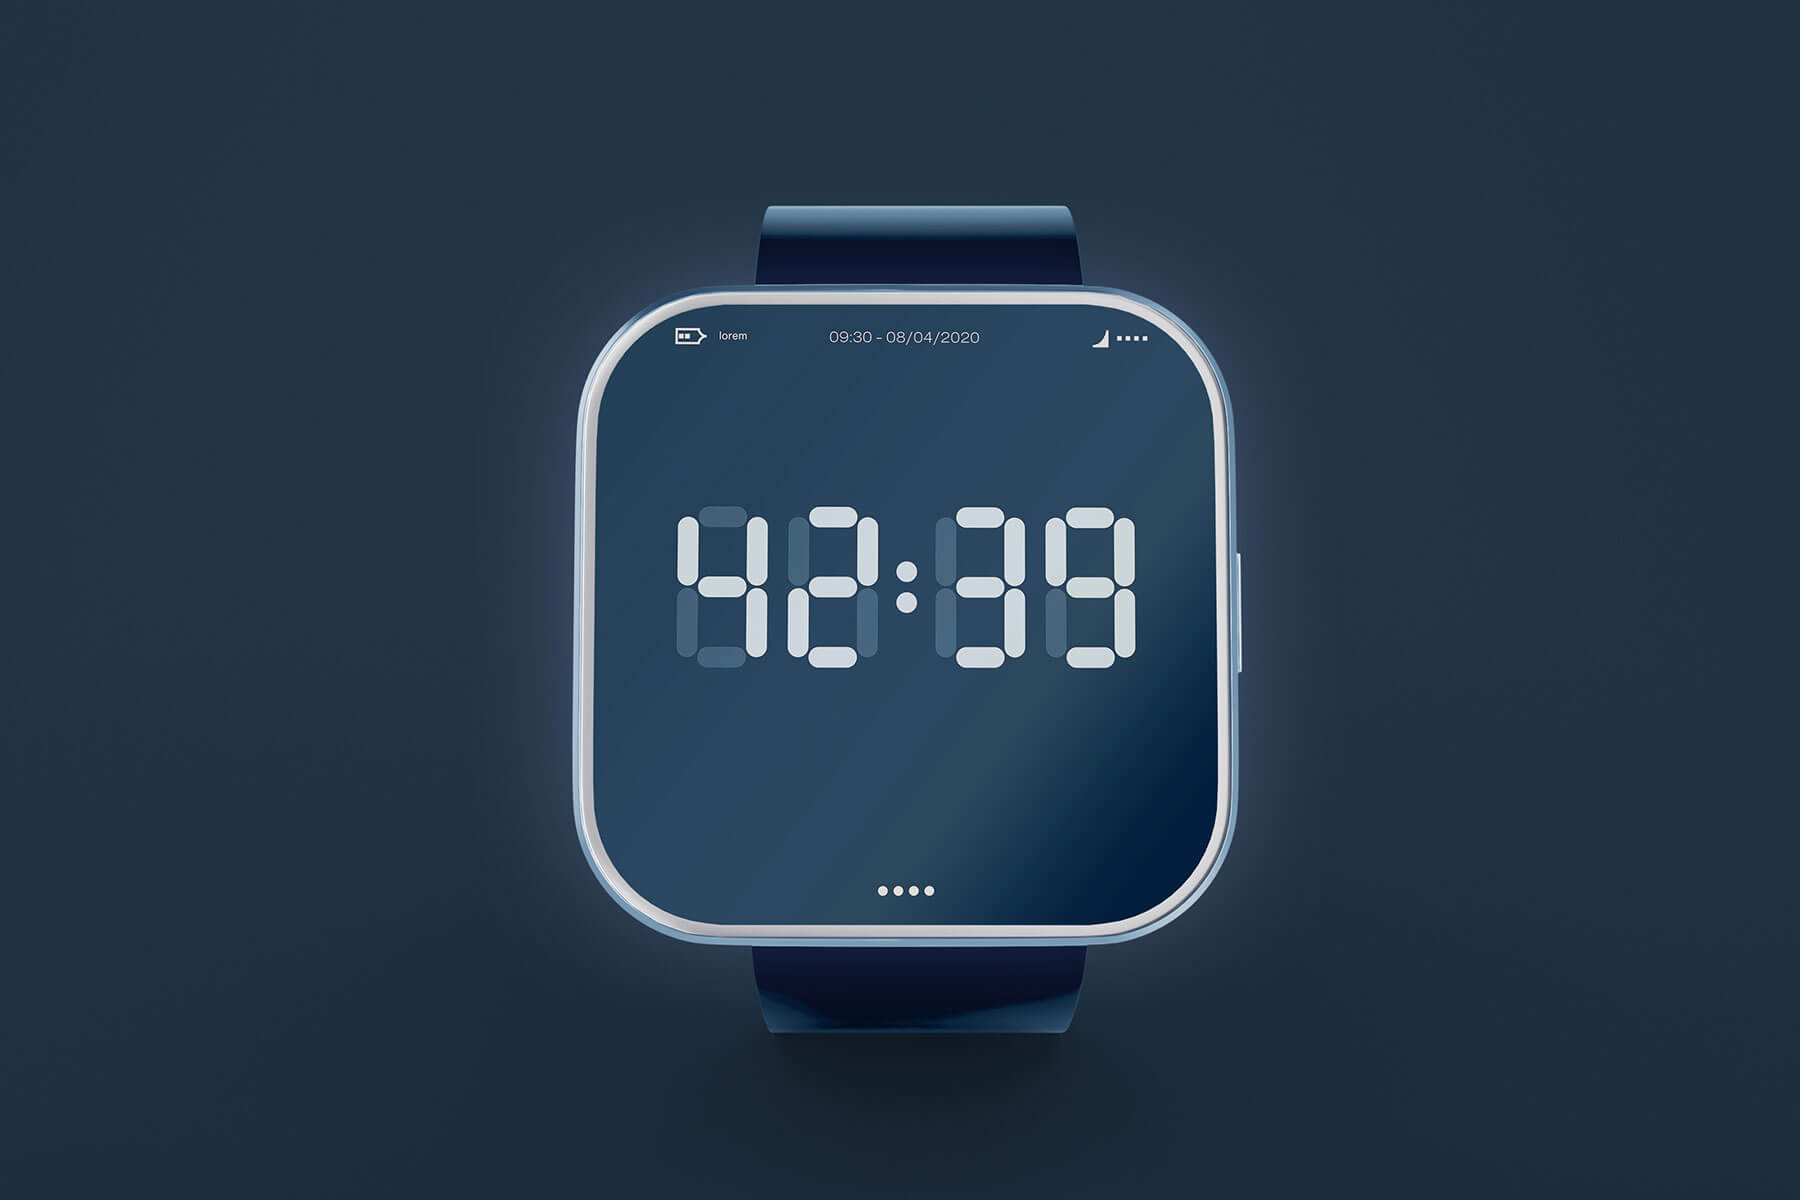 3d-illustration-smart-watch-with-time-on-screen-PQKJKZZ.jpg